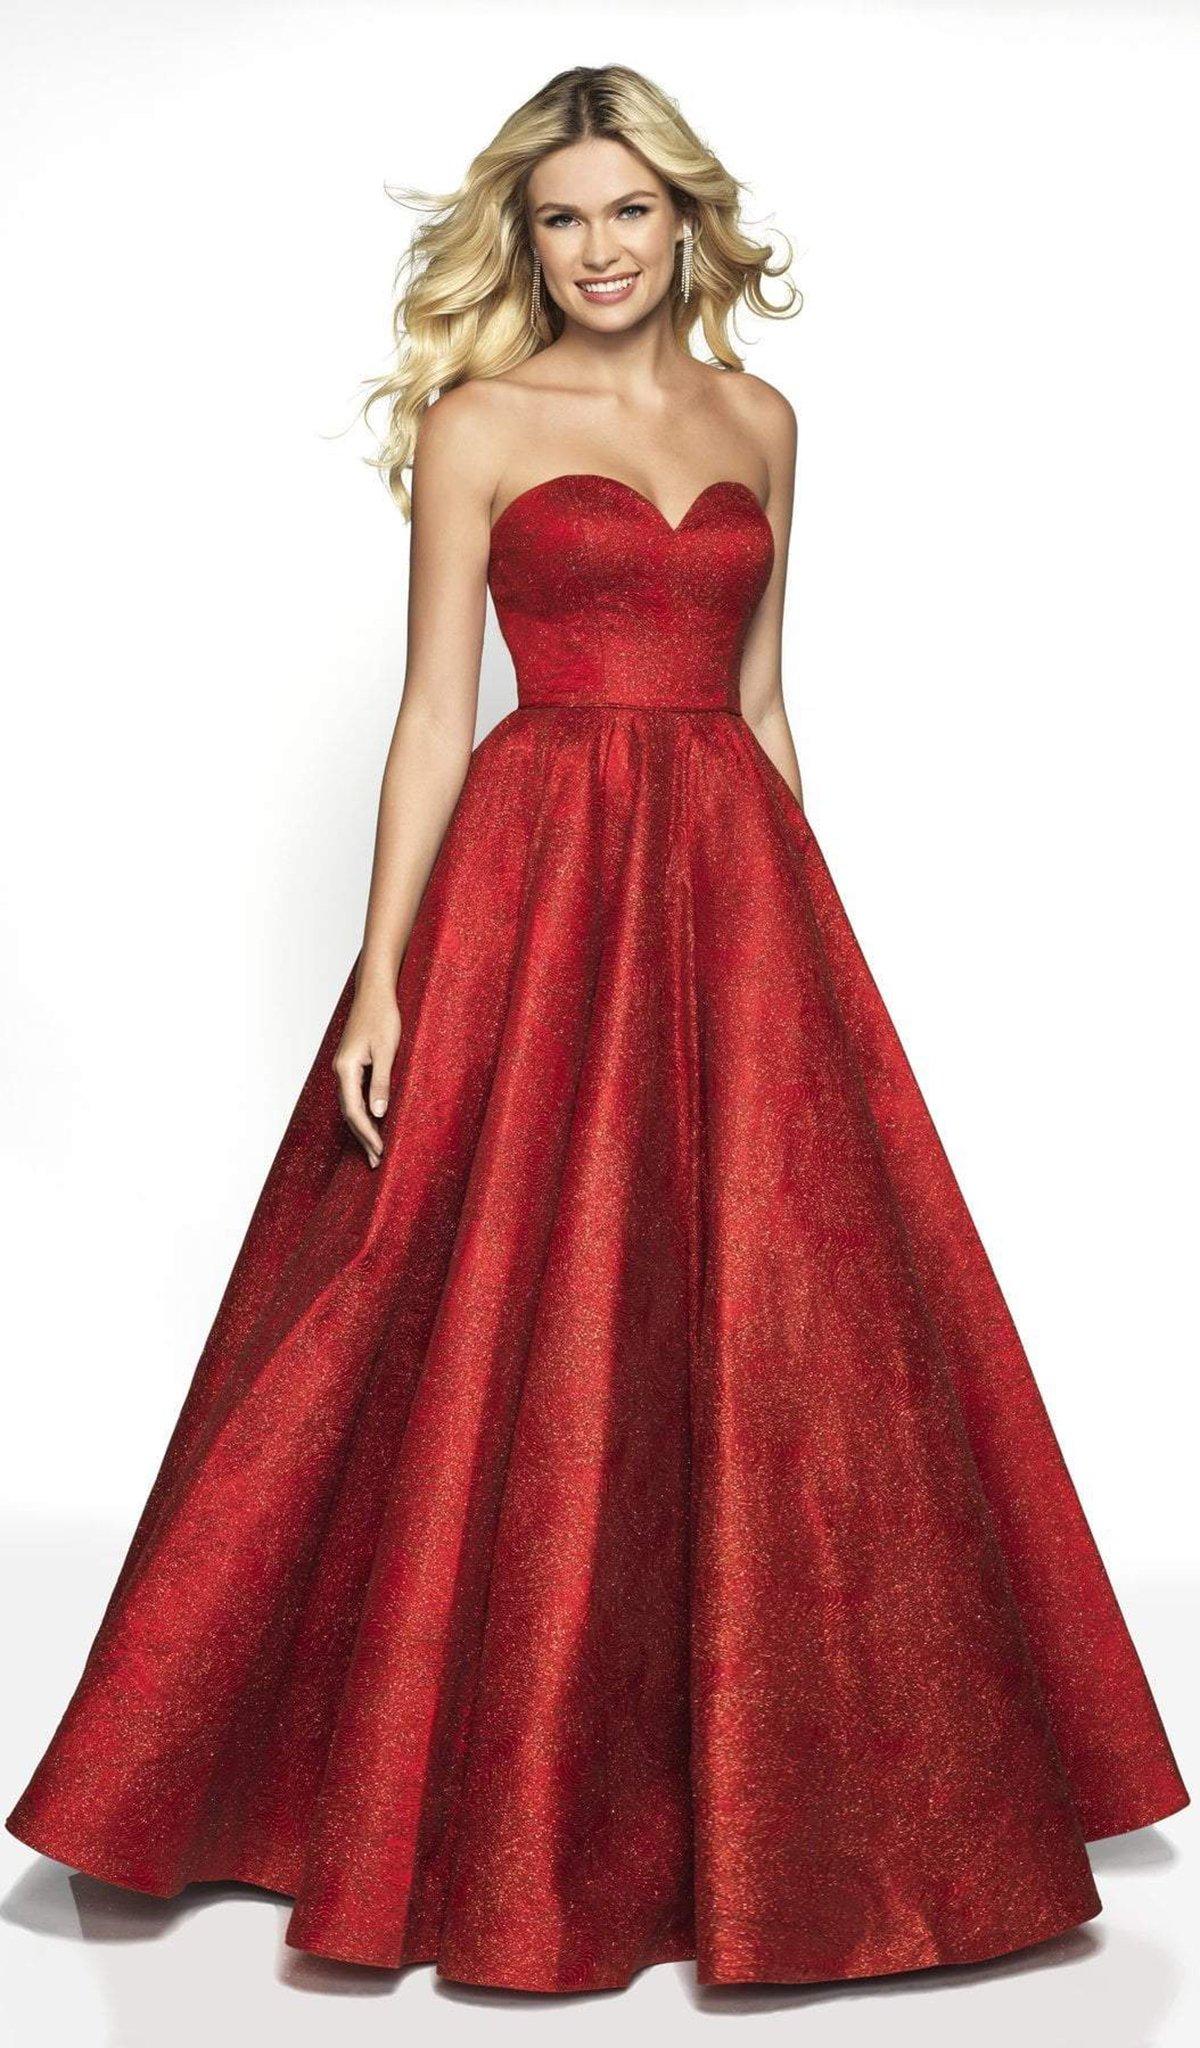 Blush by Alexia Designs - 5705 Strapless Sweetheart Ballgown